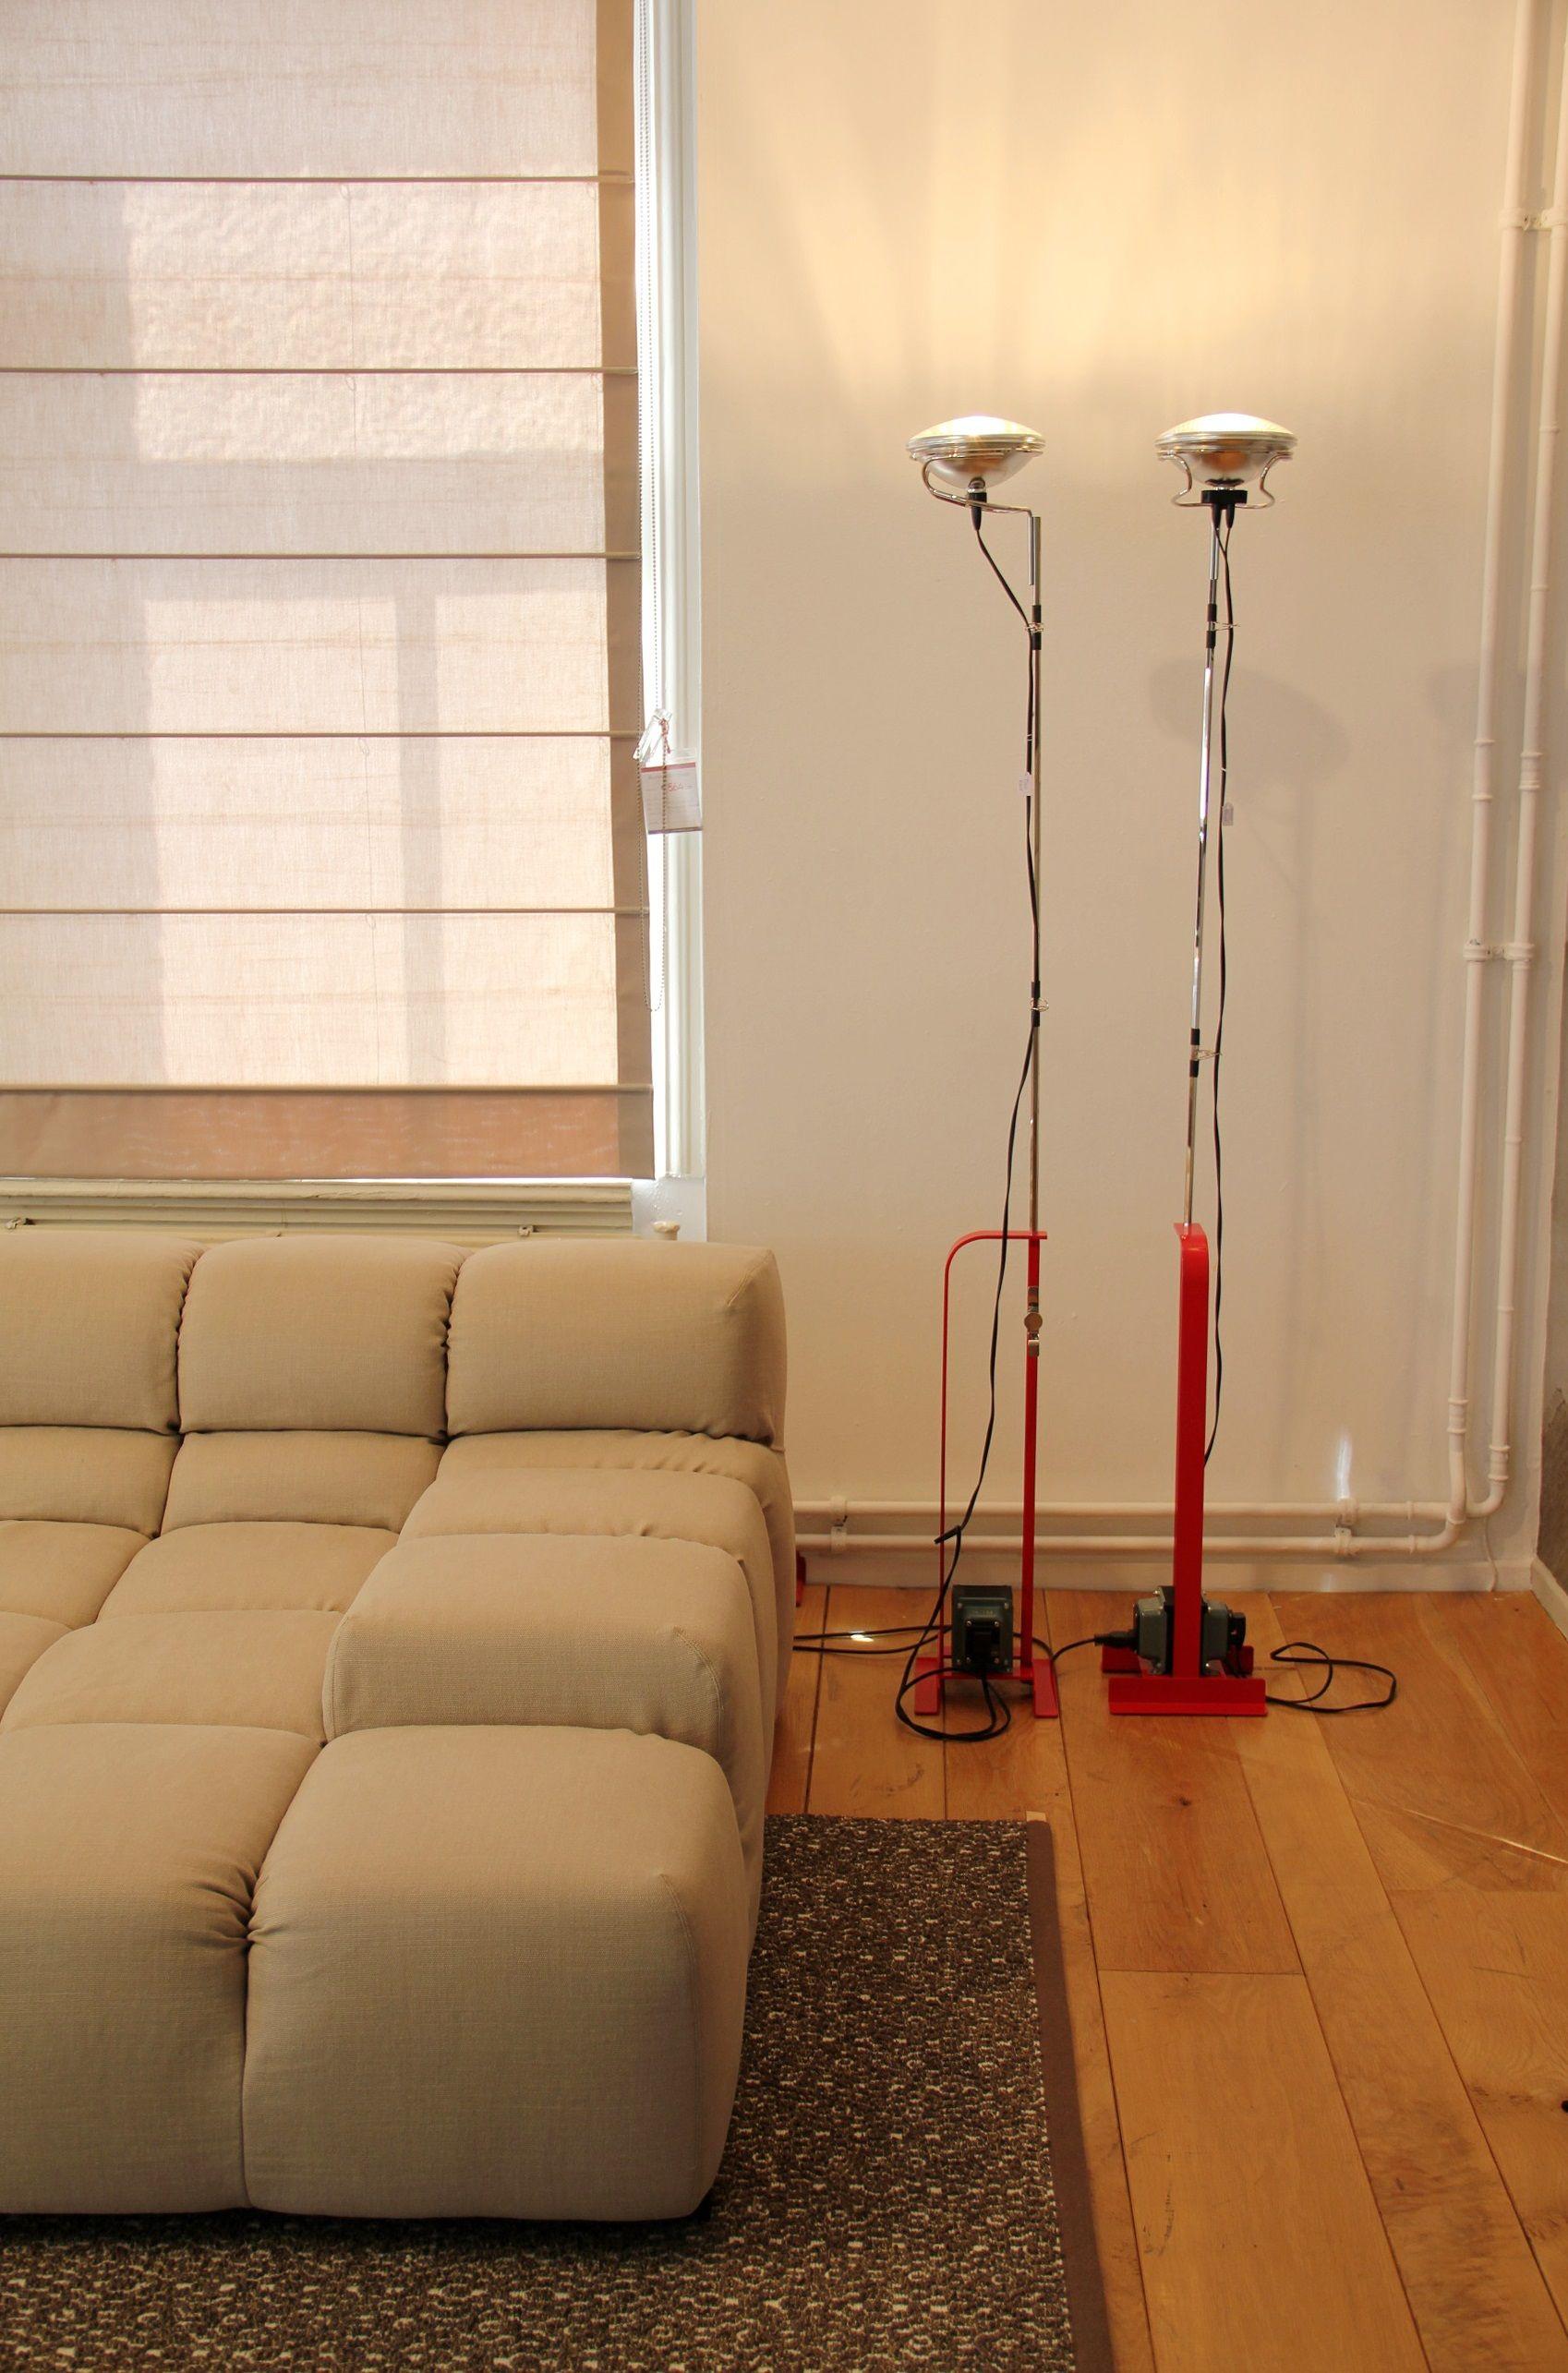 Flos toio floorlamp lamps and lighting shop pinterest flos toio floorlamp aloadofball Gallery